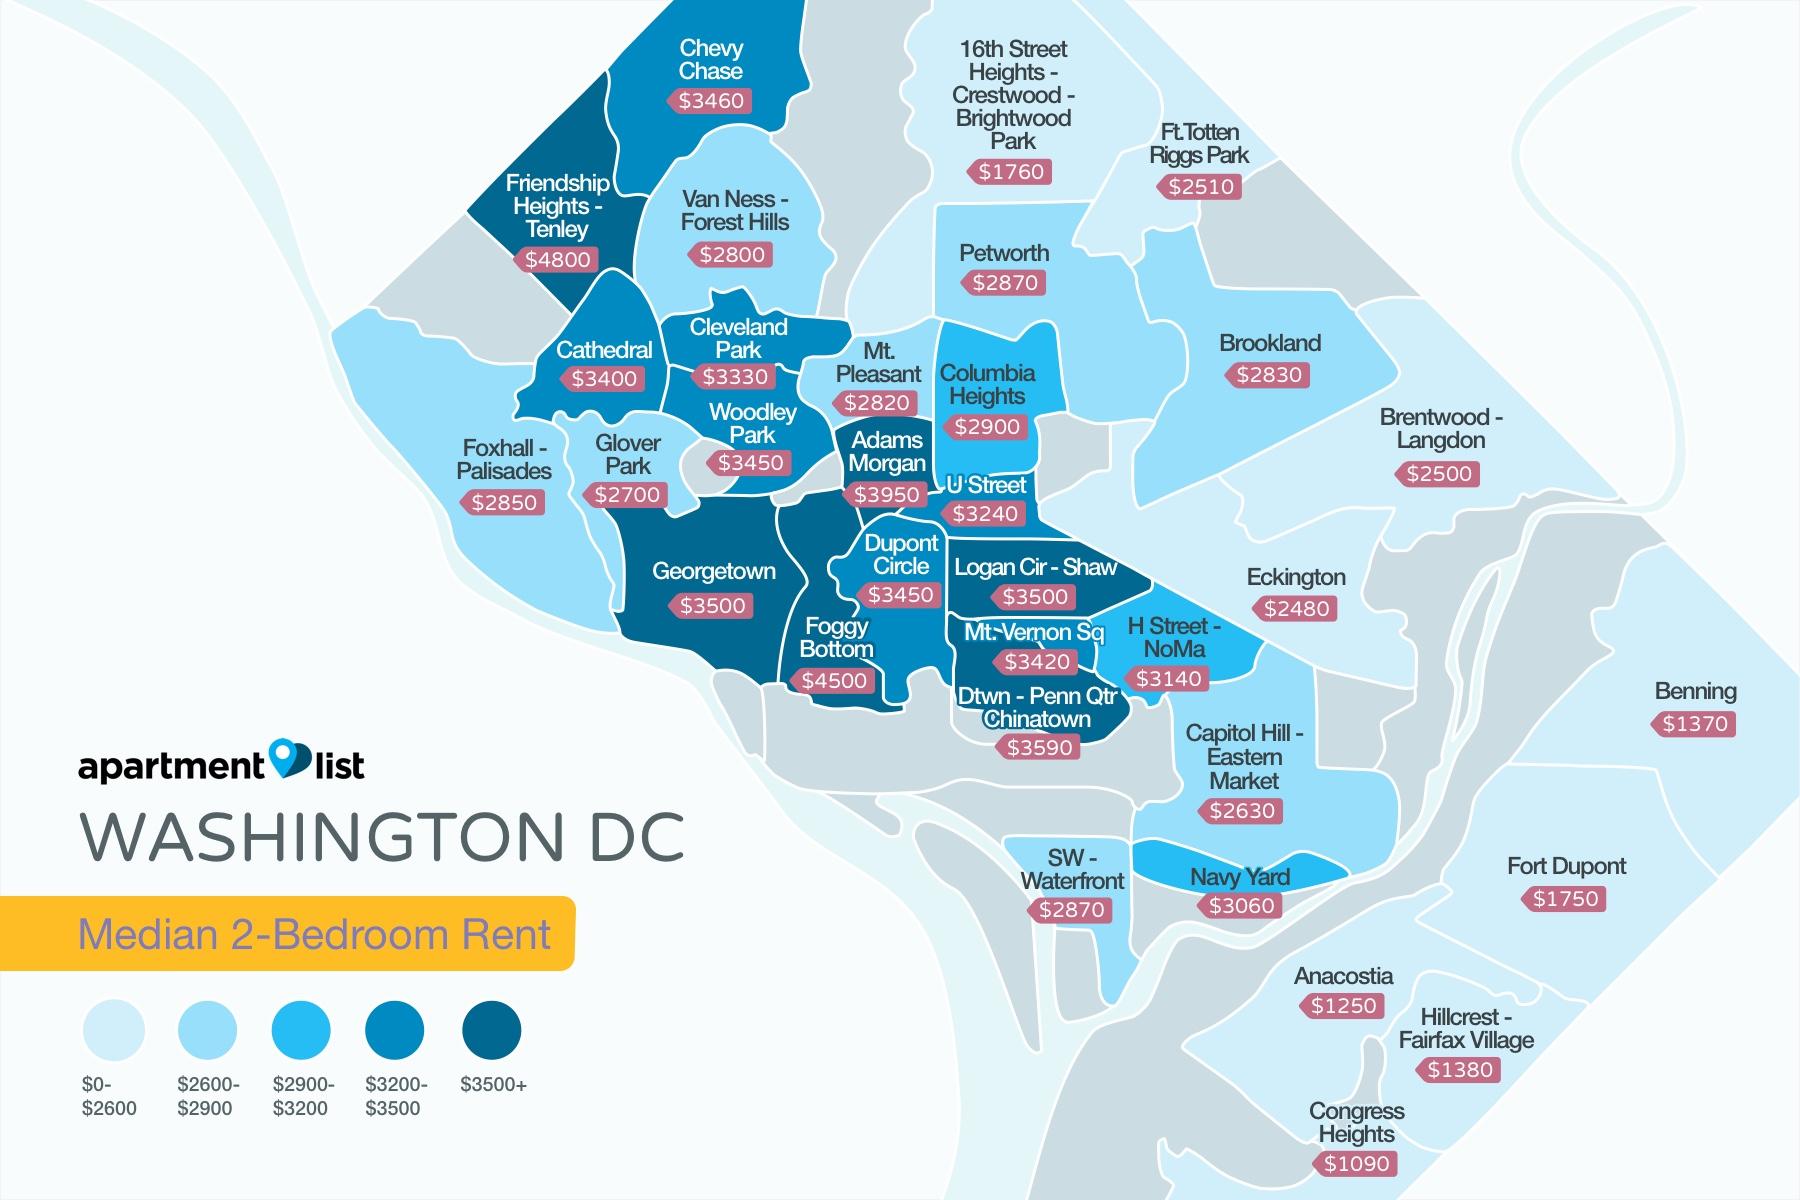 Washington DC Neighborhood Price Map